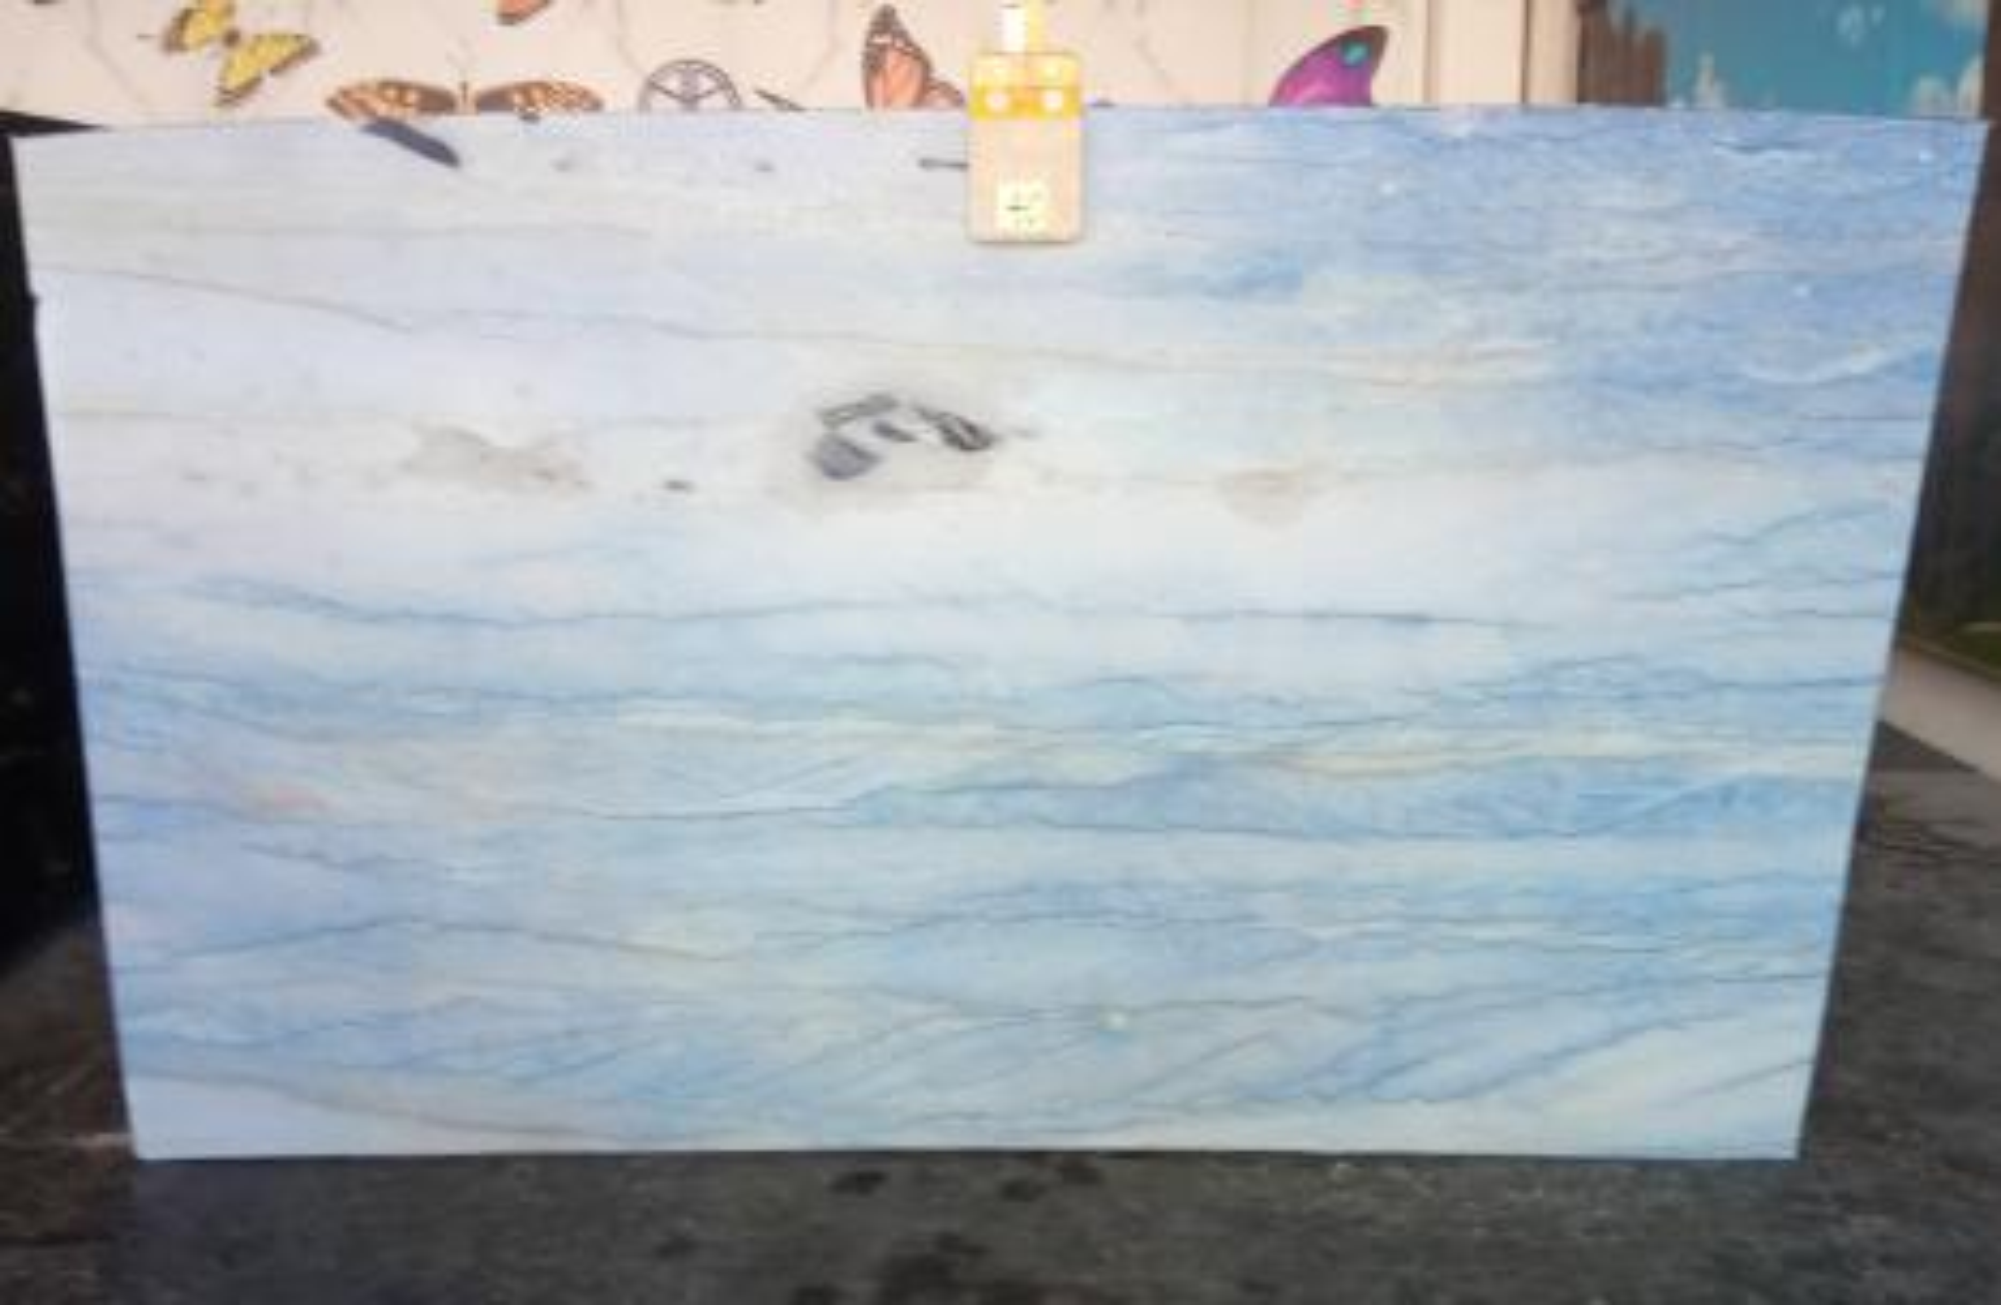 AZUL MAKAUBA Suministro Veneto (Italia) de planchas pulidas en mármol natural Z0191 , Slab #40